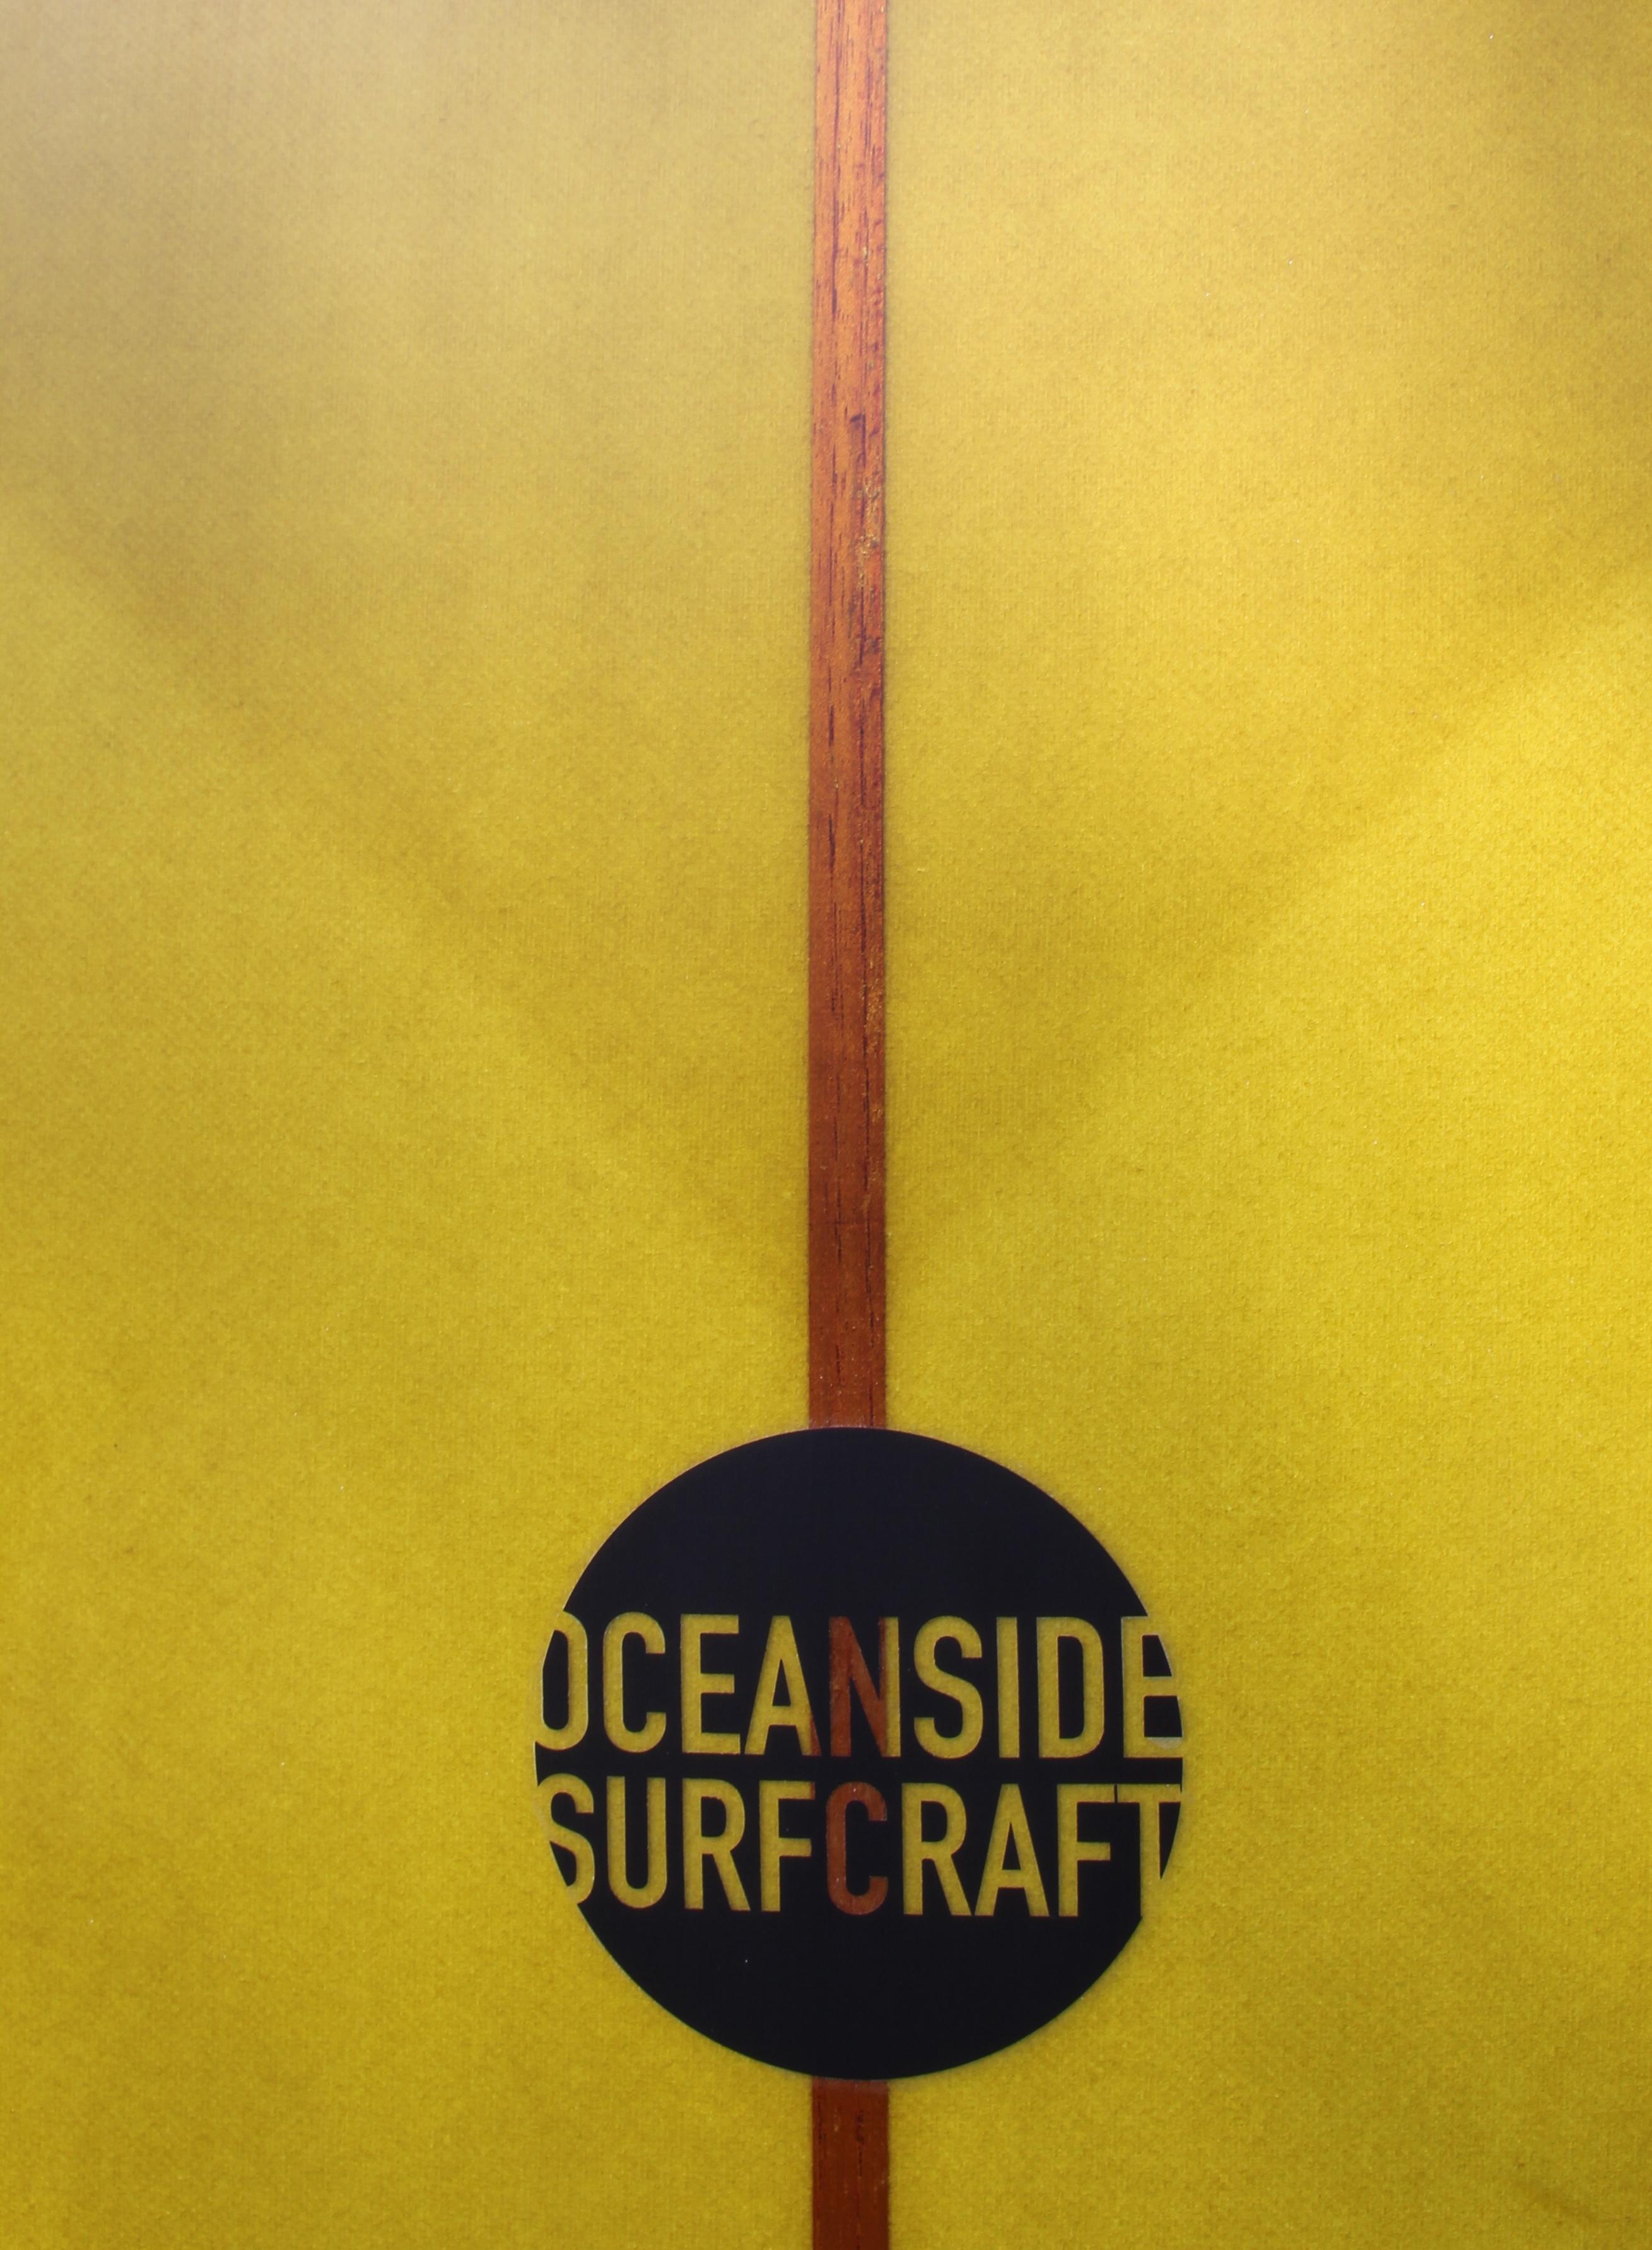 oceanside surfcraft longboard sydney